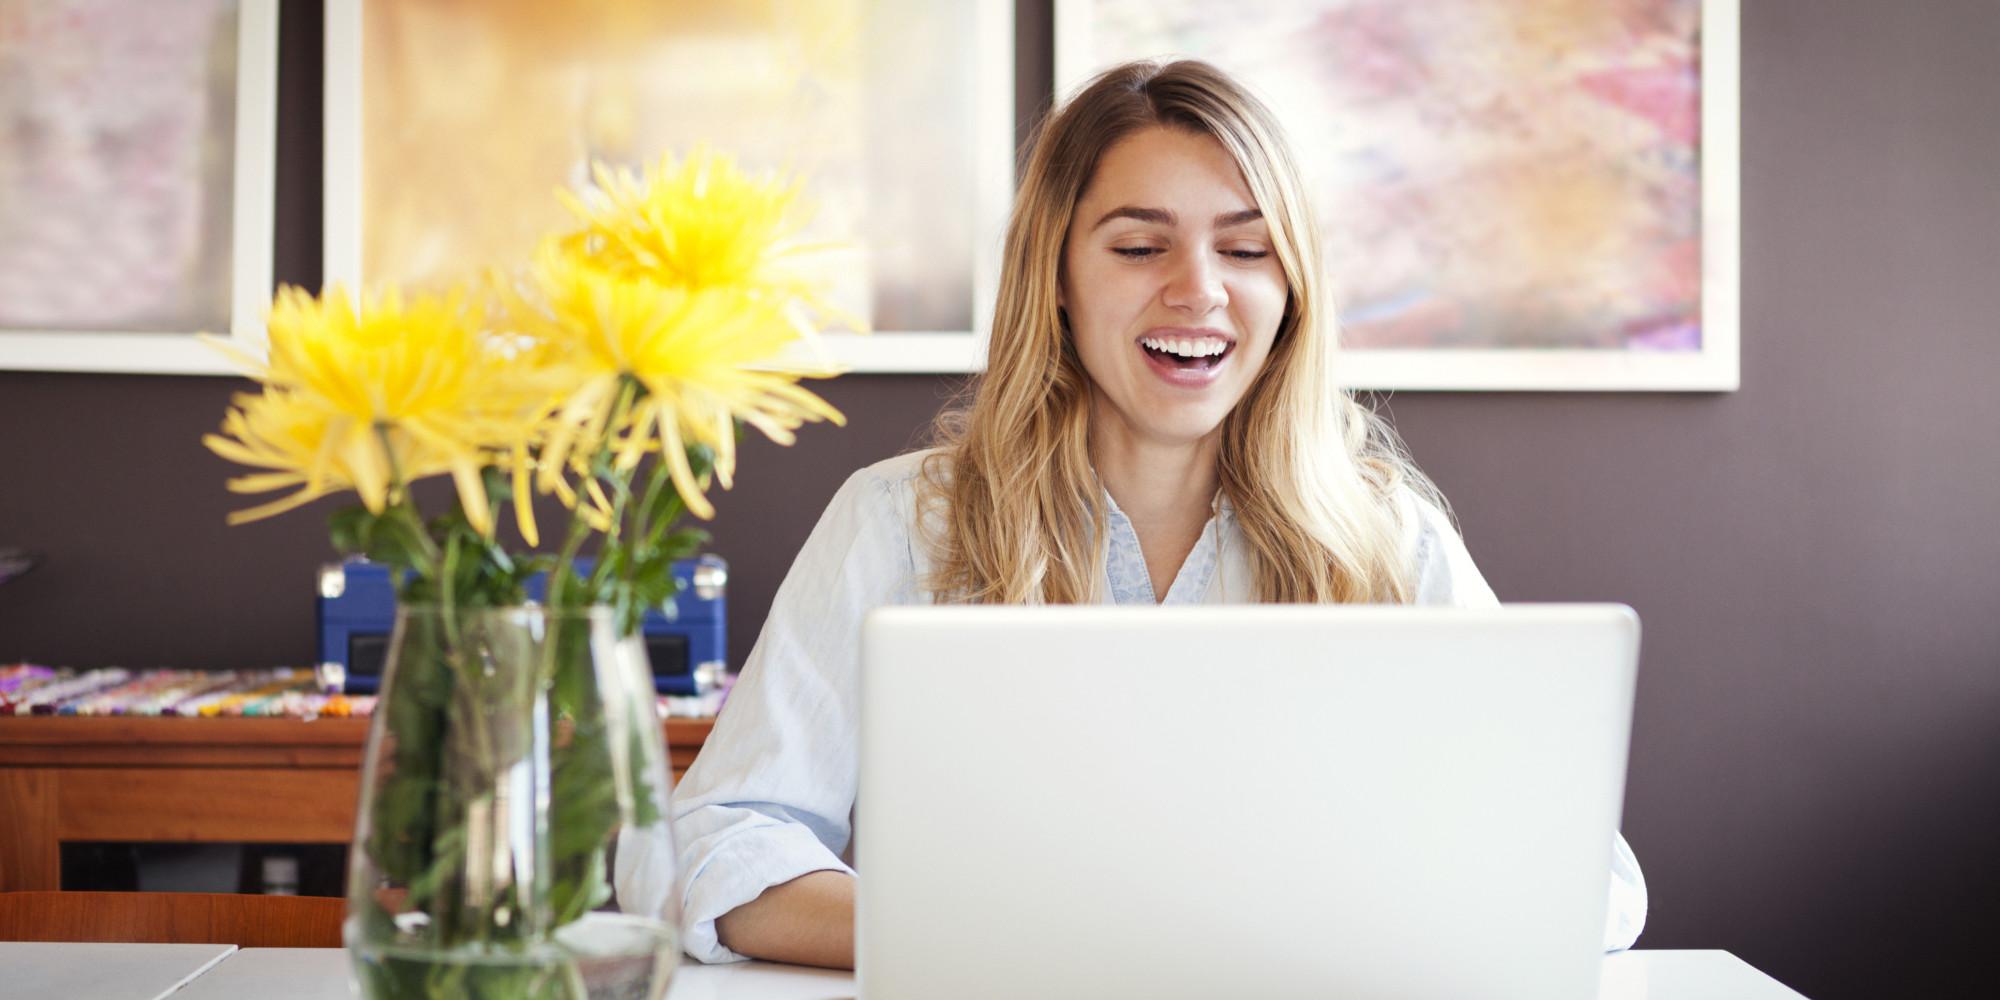 online dating success stories long distance